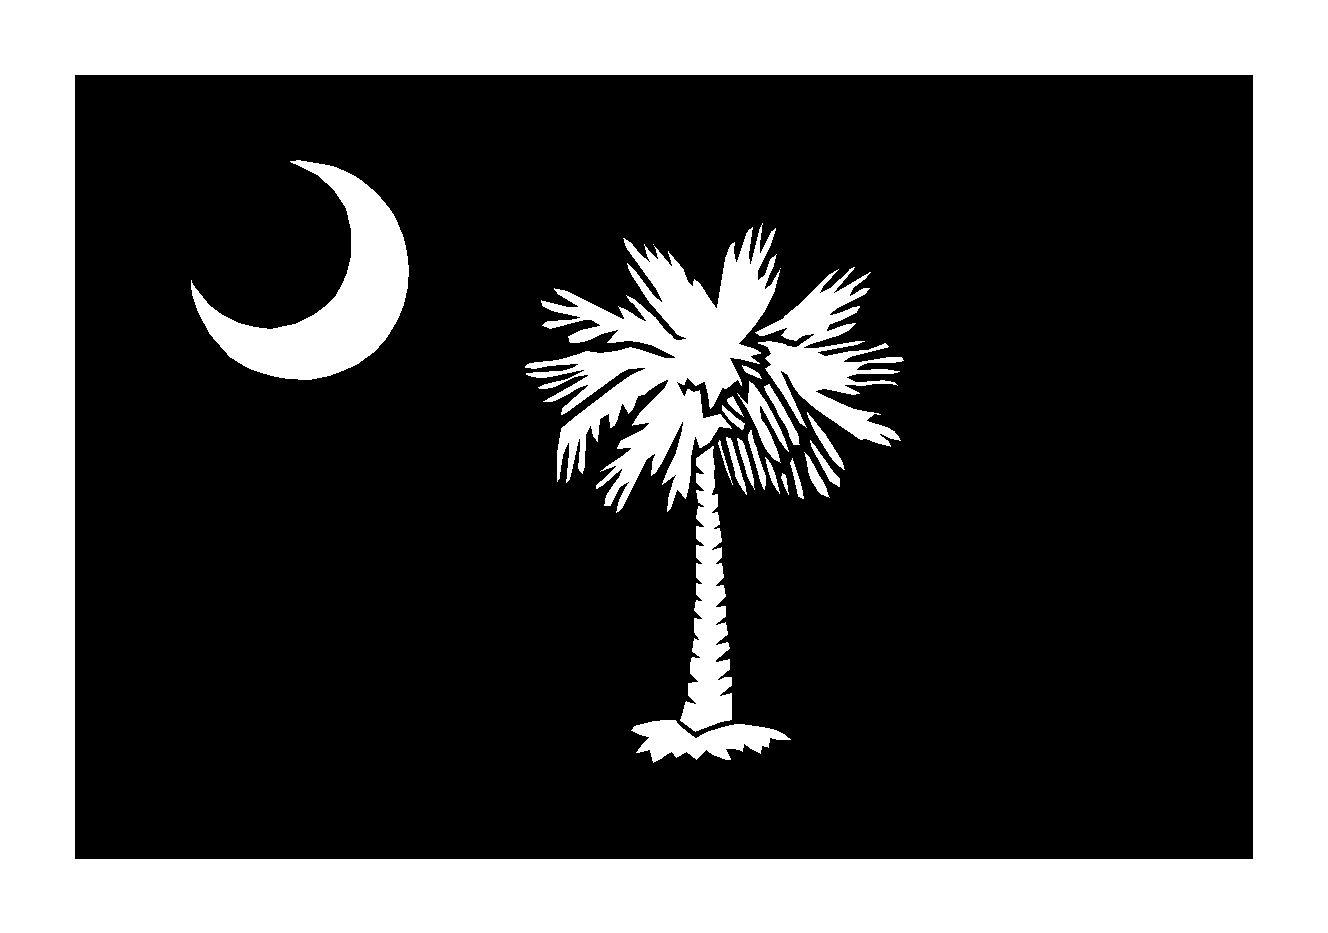 Sc Flag Tattoos: Black And White Image Of Tree